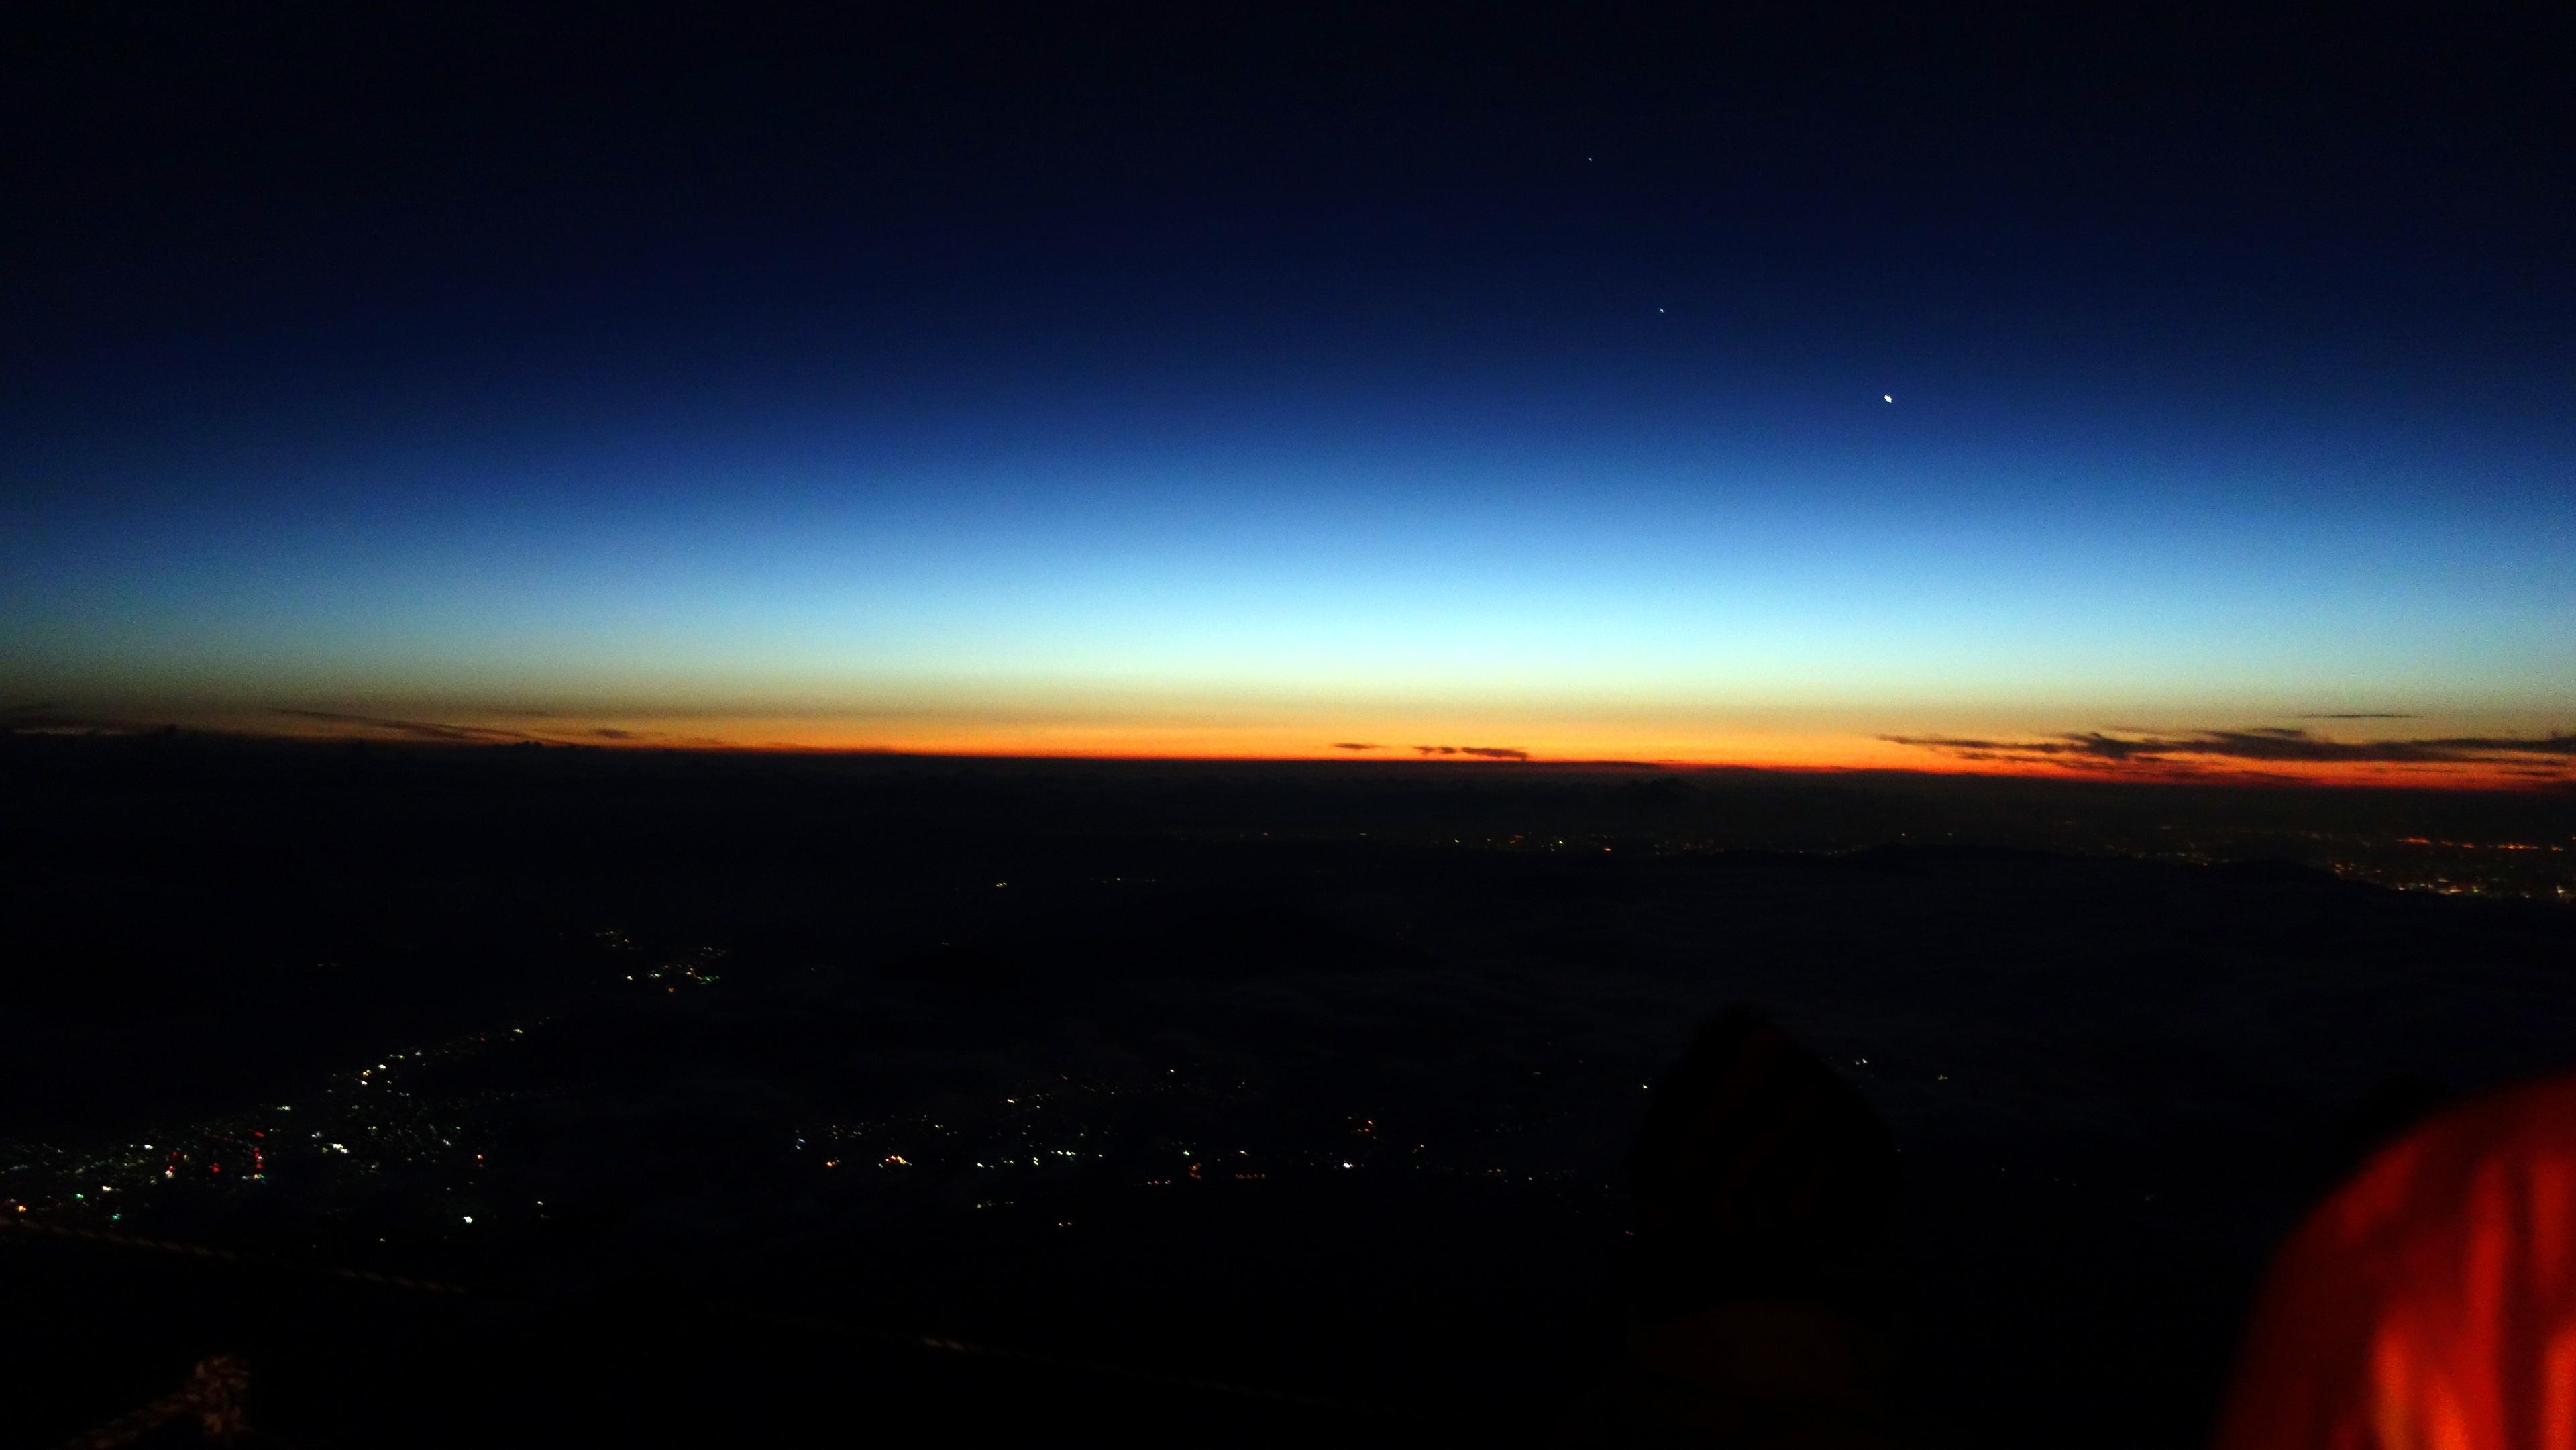 20140806 212250 fujisan first light